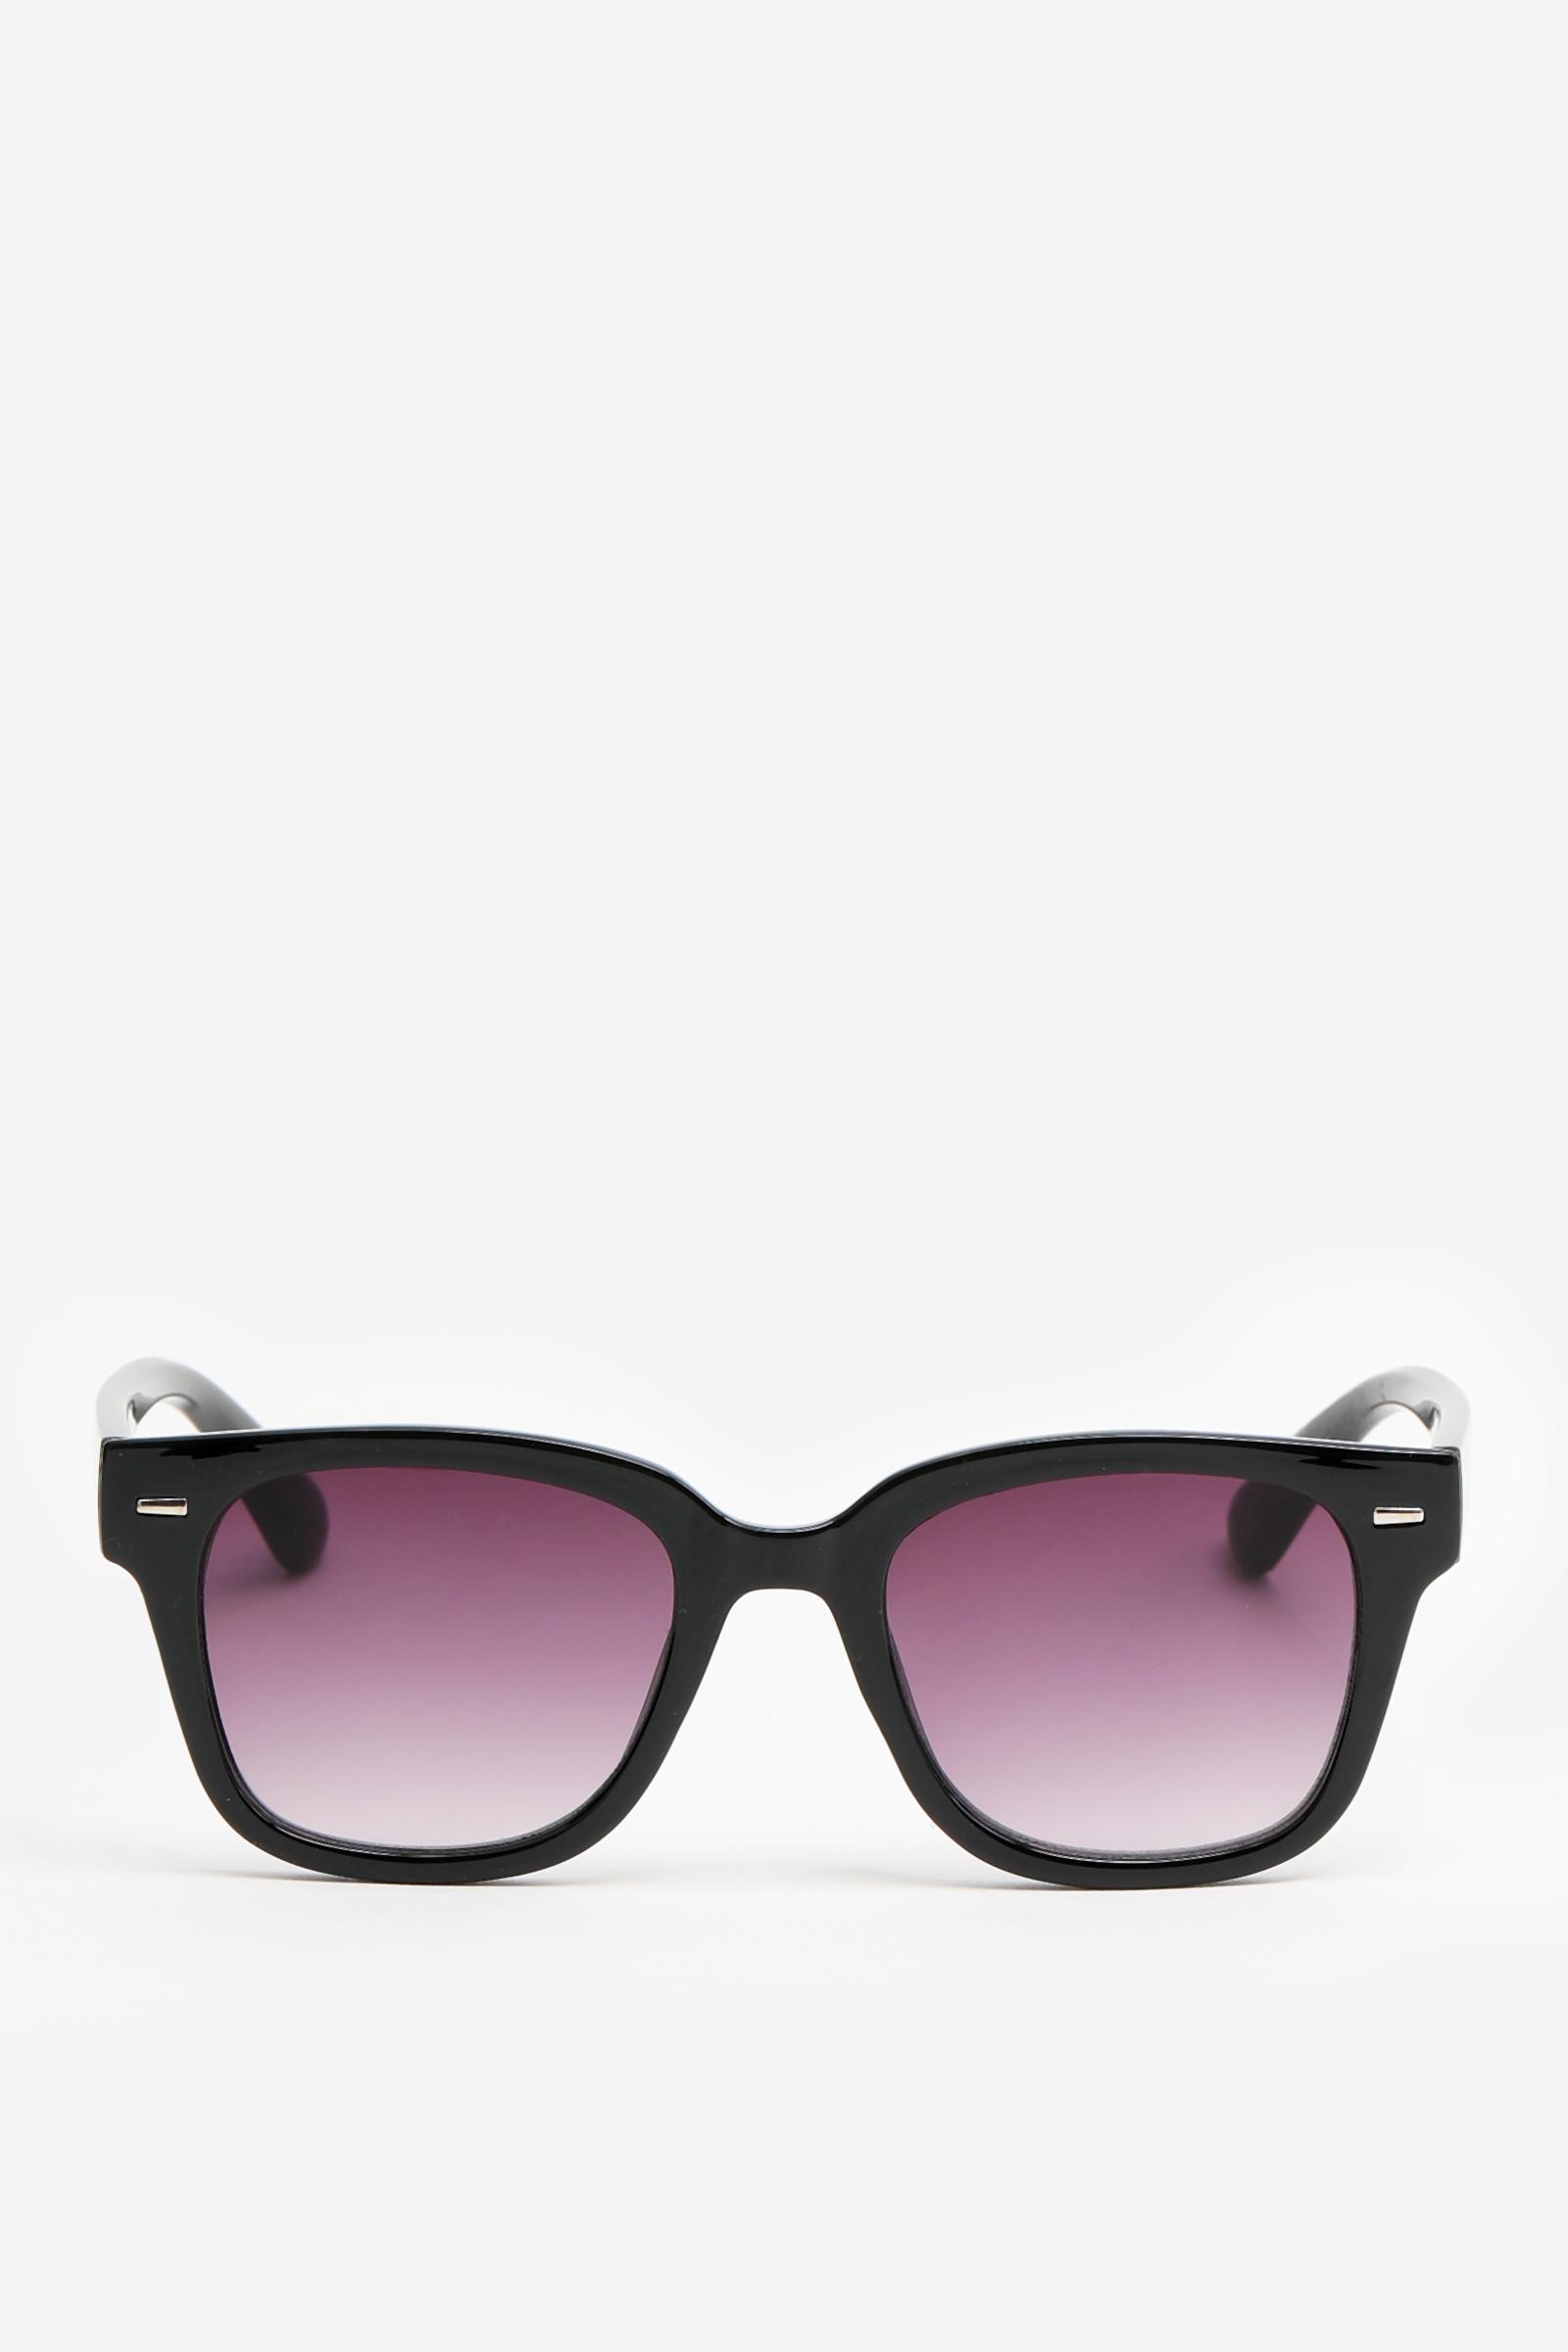 Ombre Wayfarer Sunglasses